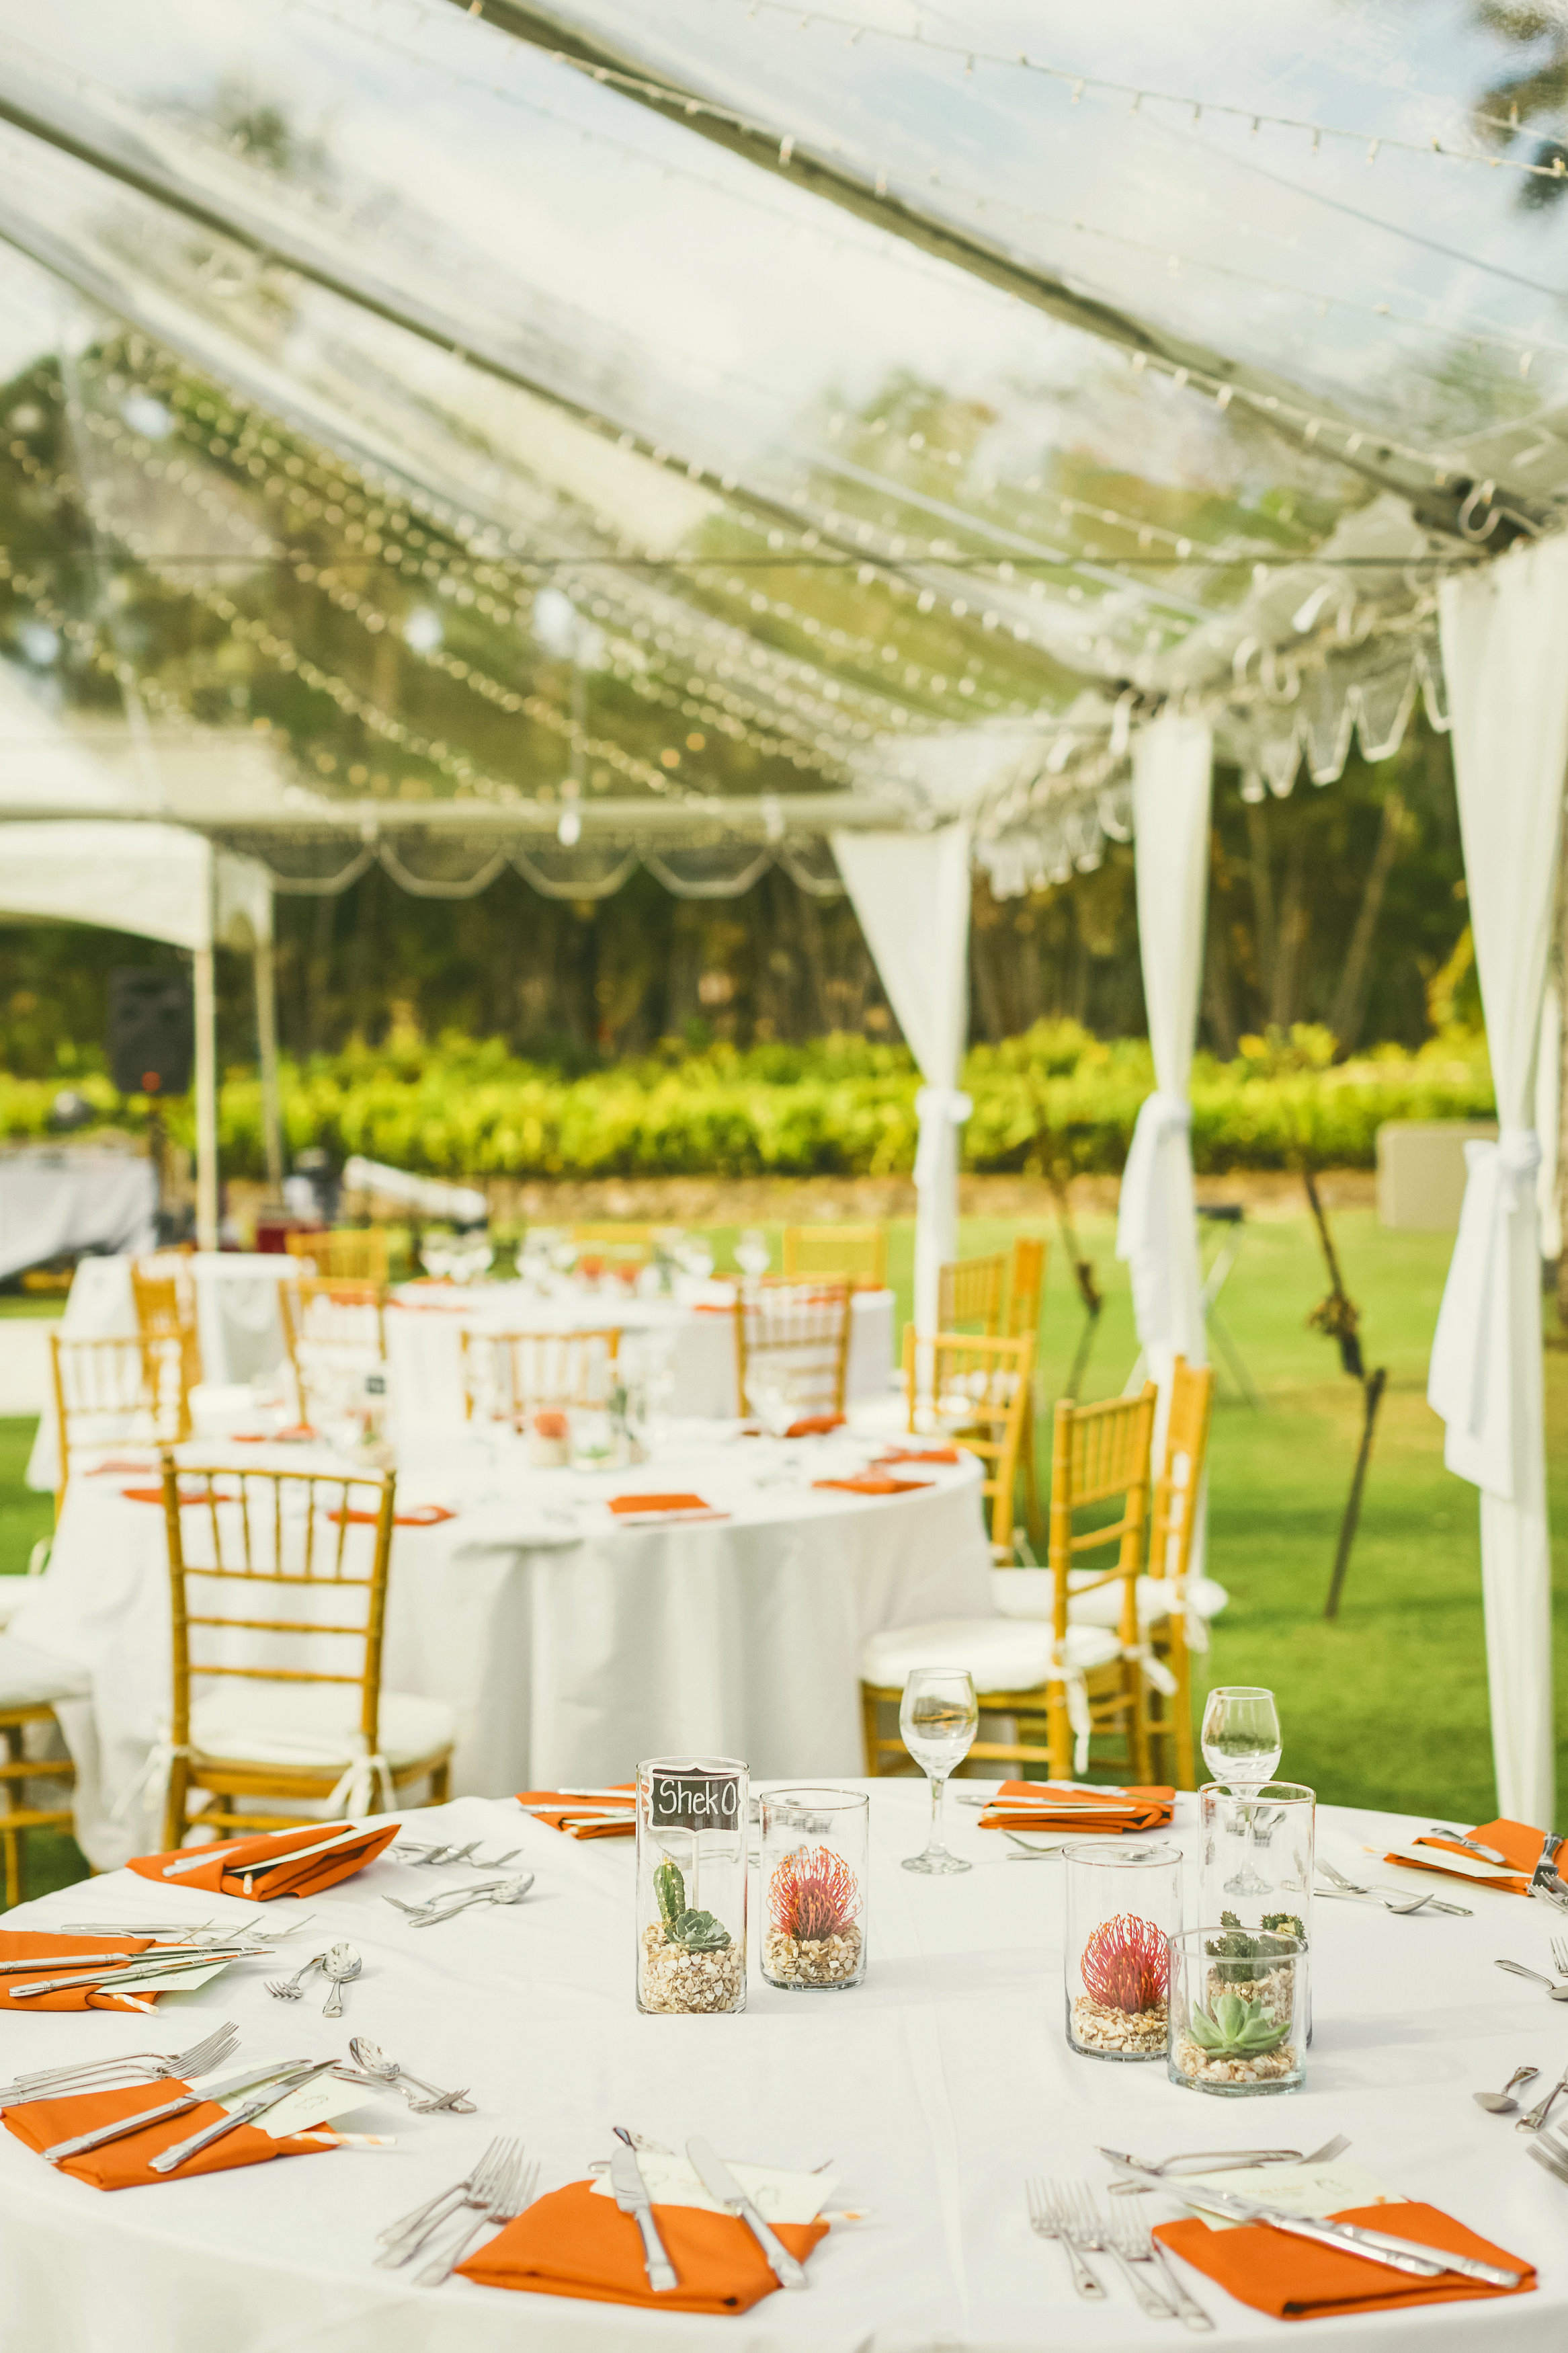 angie-diaz-photography-oahu-wedding-lanikuhonoa-shenshen-marshall-47.jpg